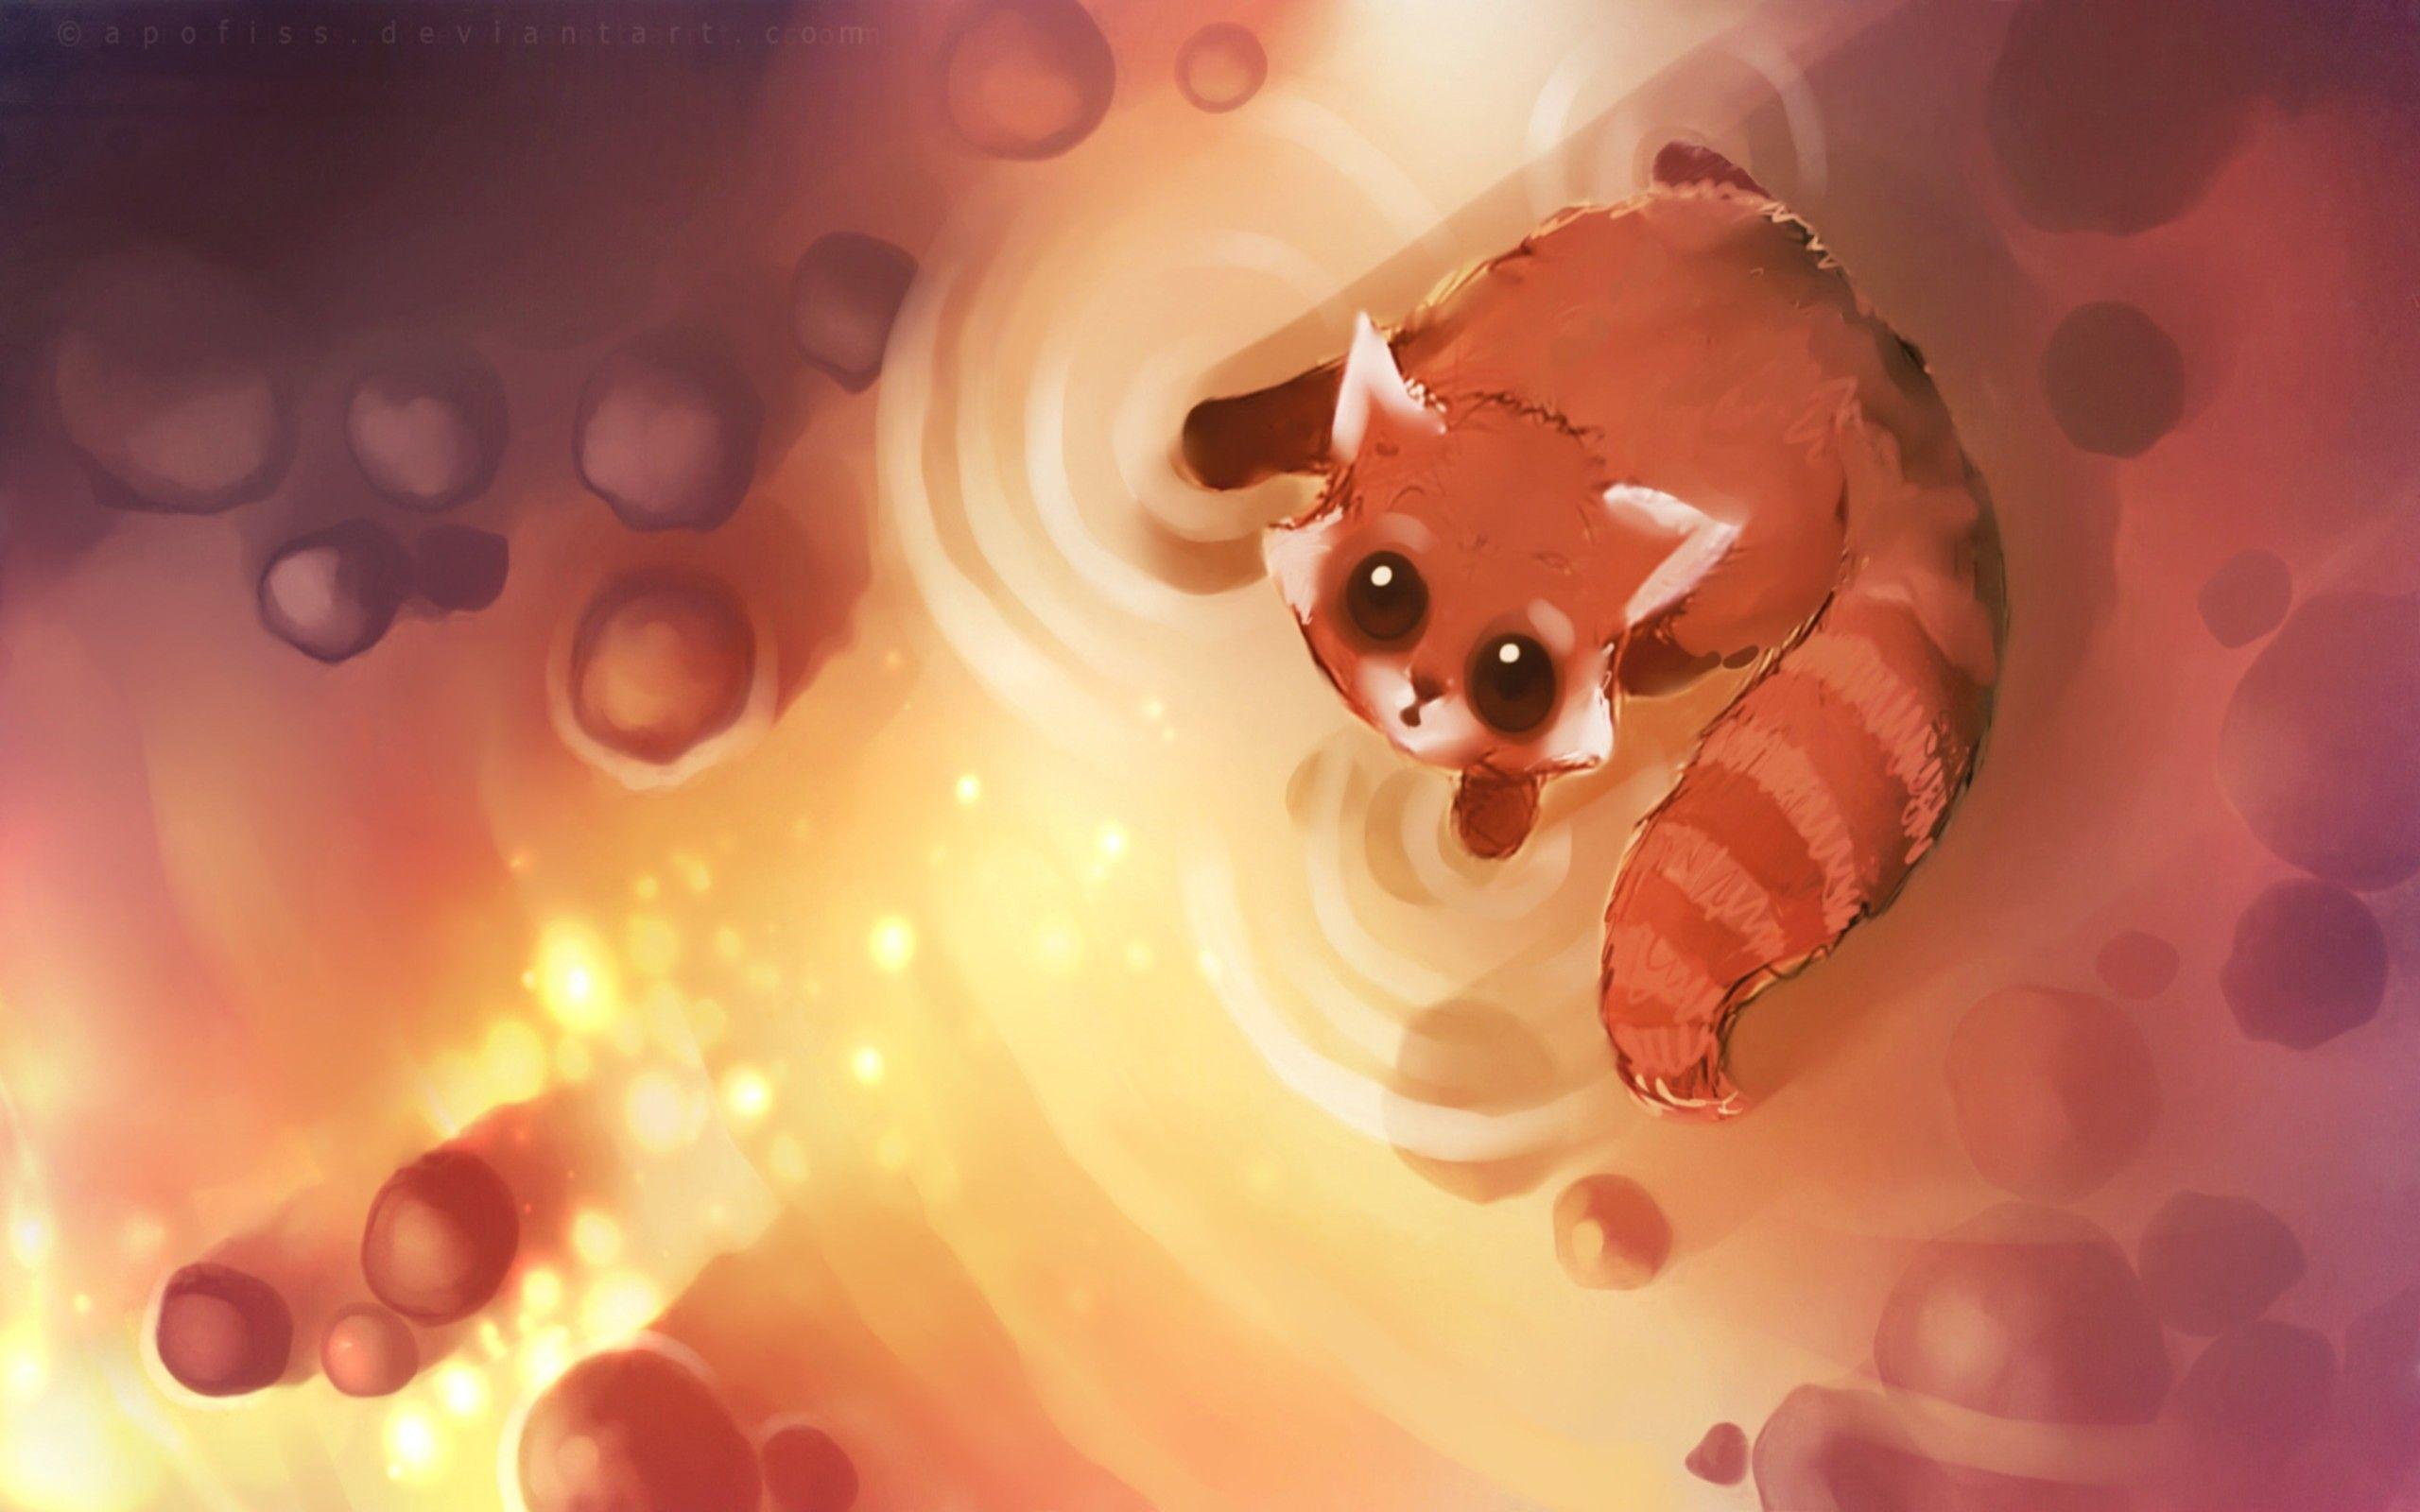 Animaux Panda Roux Animaux Fond D Ecran Panda Rouge Panda